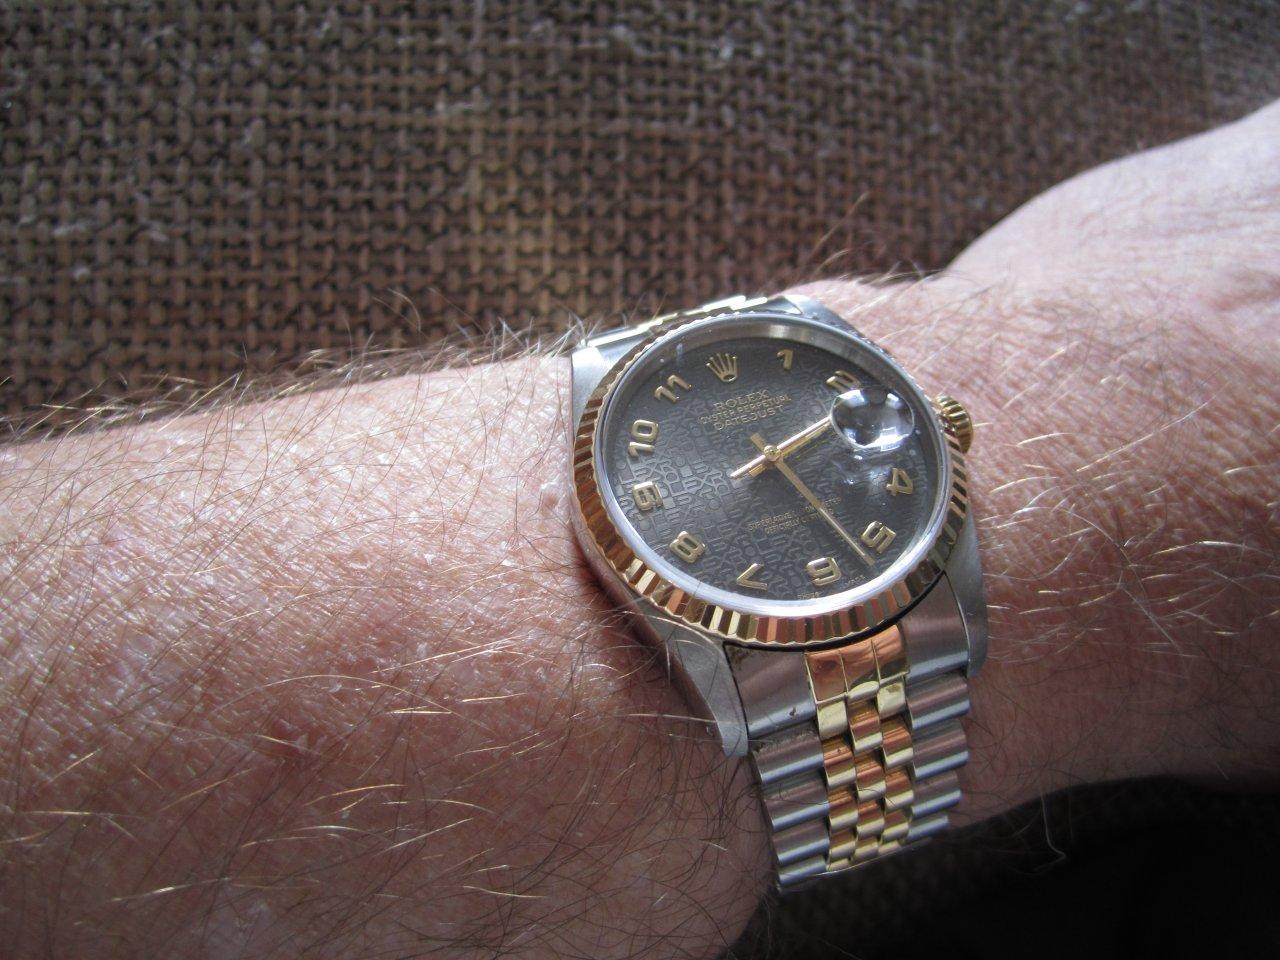 Armbanduhr am arm  Armbanduhr - Wo genau tragen? - UhrForum - Seite 2